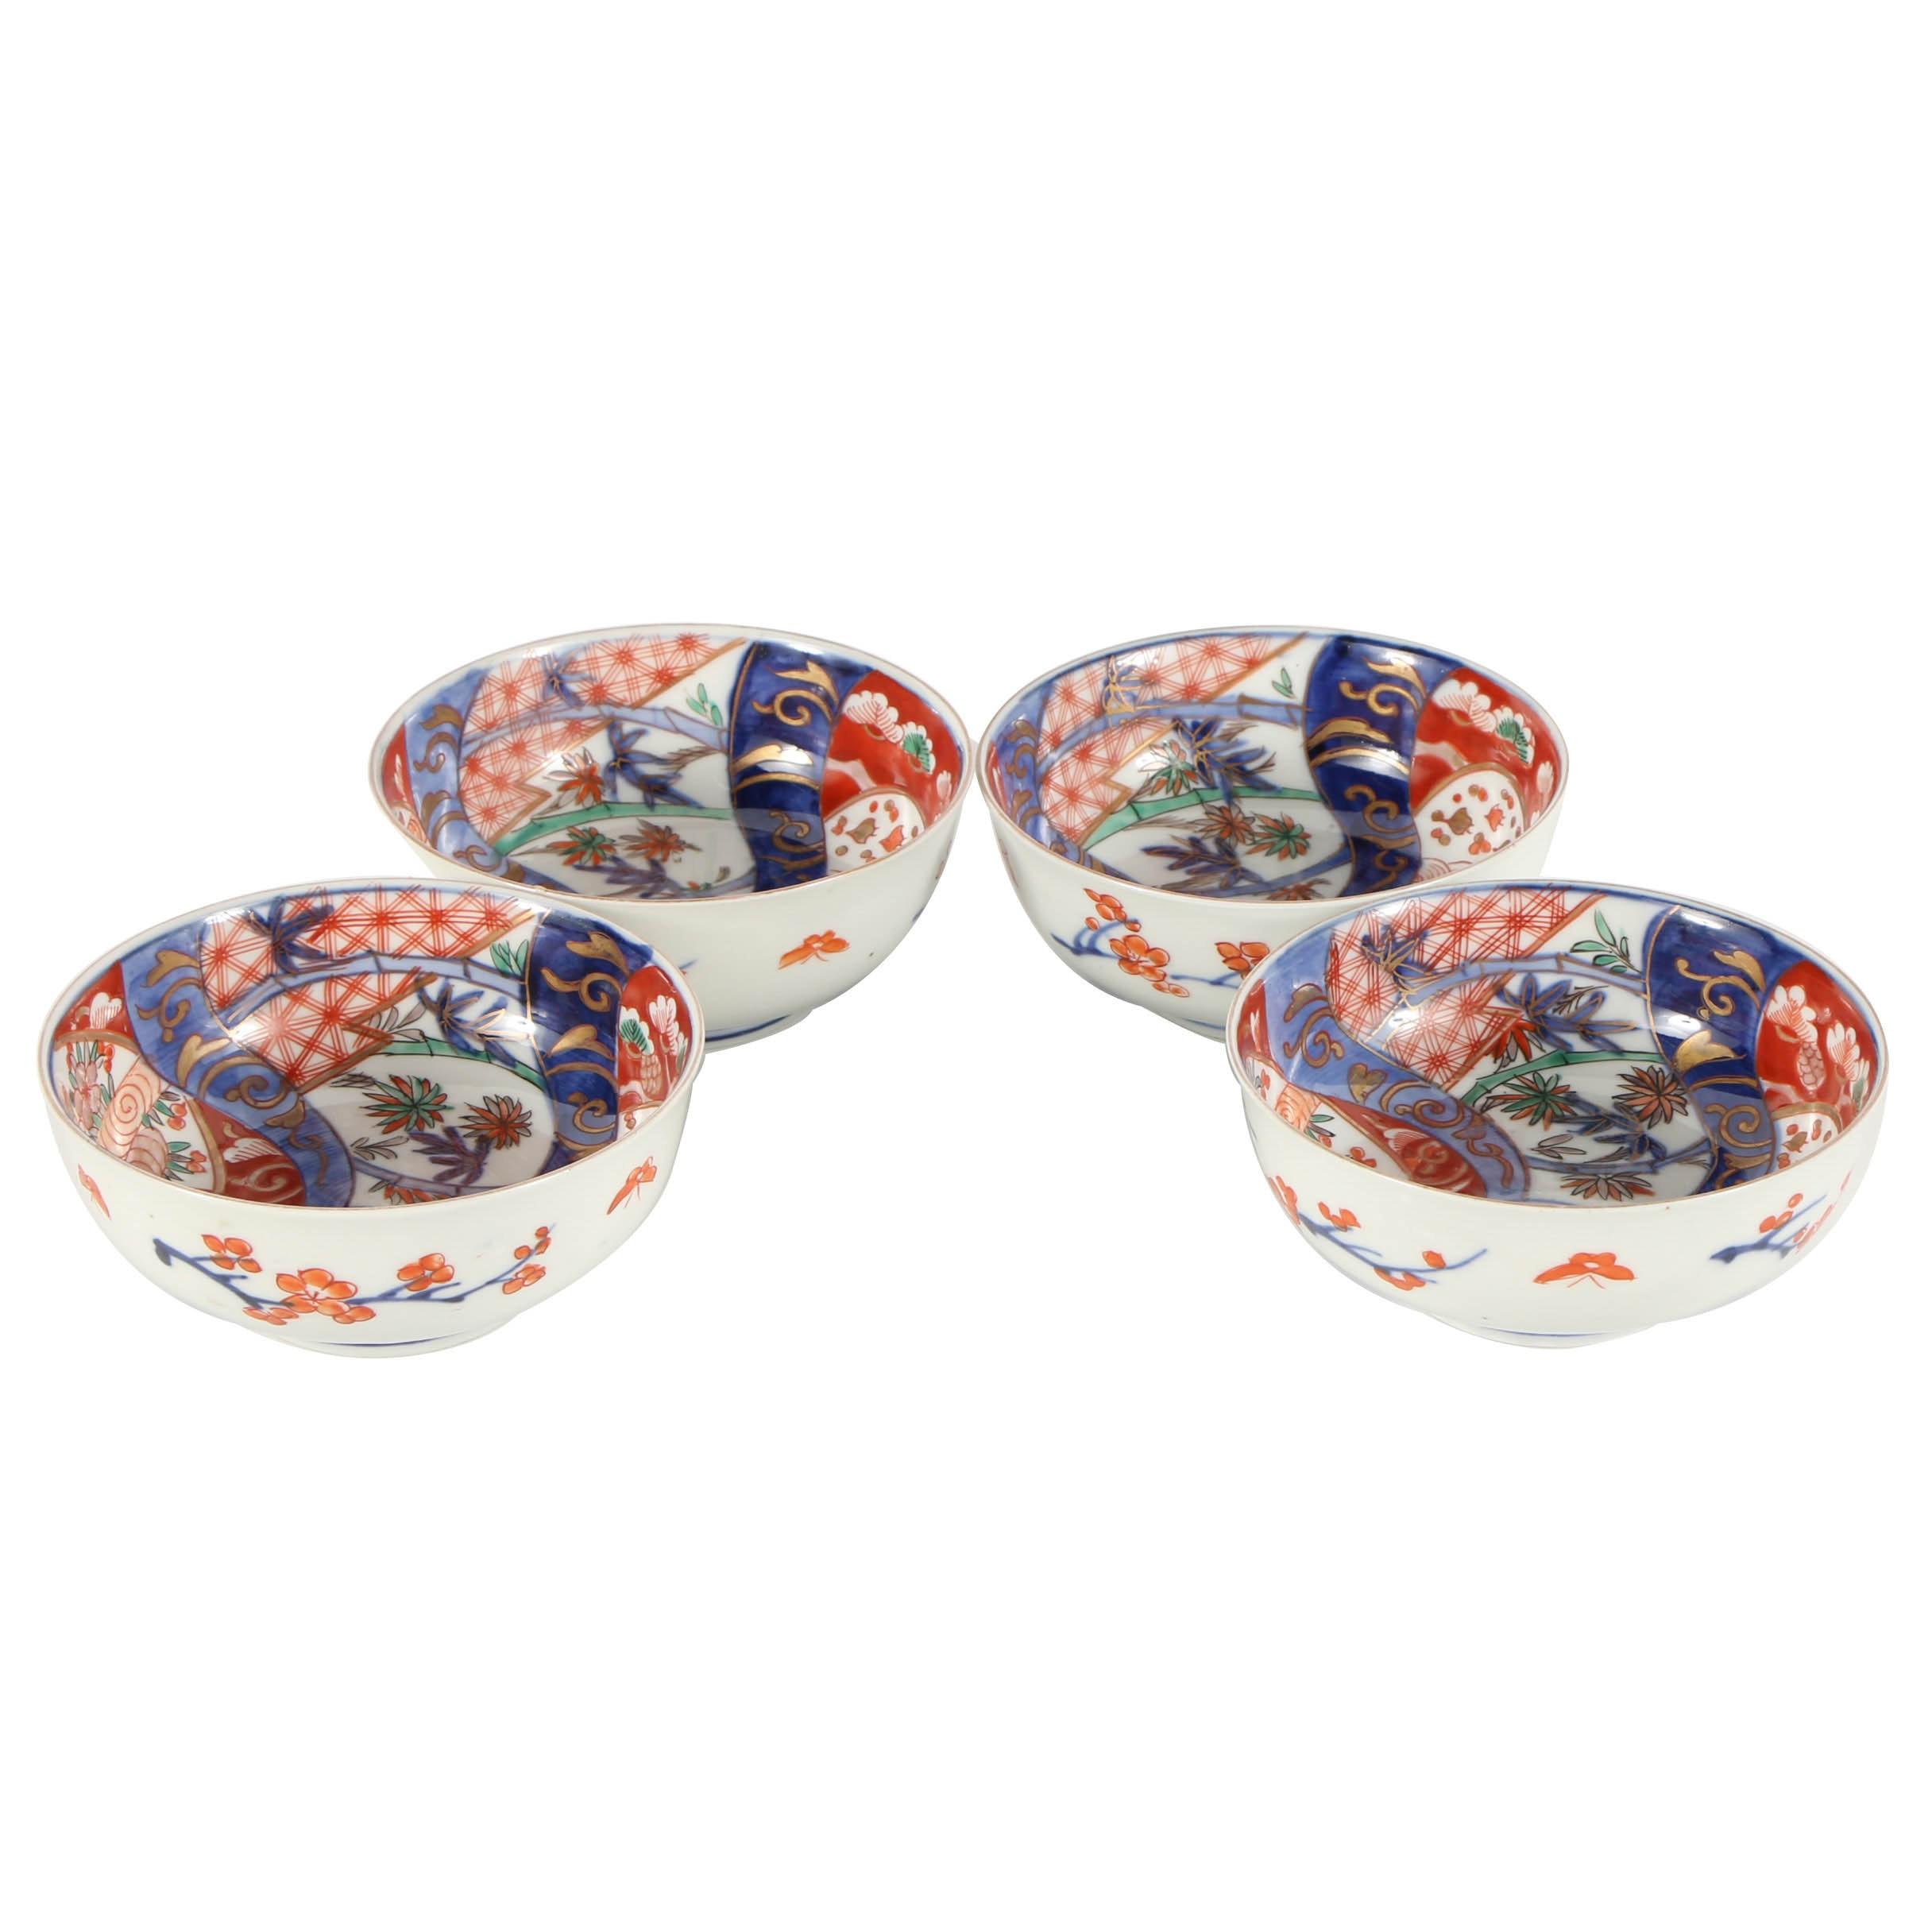 Set of Four Japanese Imari Porcelain Bowls with Floral Motifs